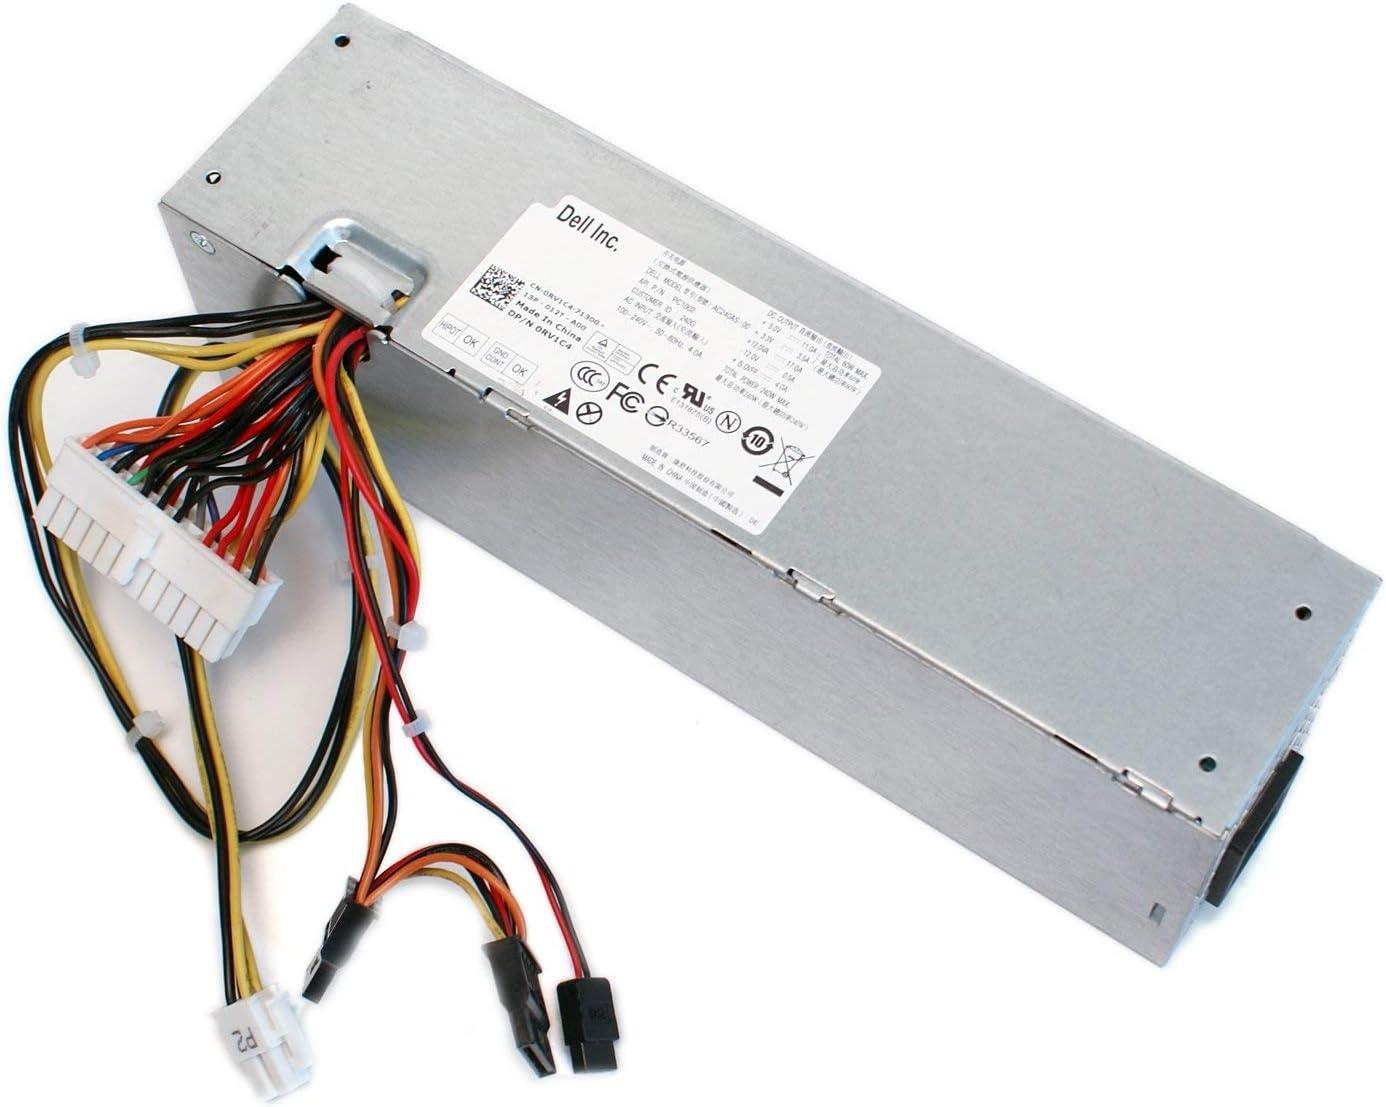 Genuine Dell 240w Power Supply PSU fit Dell Optiplex 390 790 990 3010 7010 9010 SFF model 2TXYM, RV1C4, 3WN11, J50TW, CV7D3, GFHY9, 709MT, F79TD, PH3C2, J50TW, T5VF6, VMRD2 (Renewed)